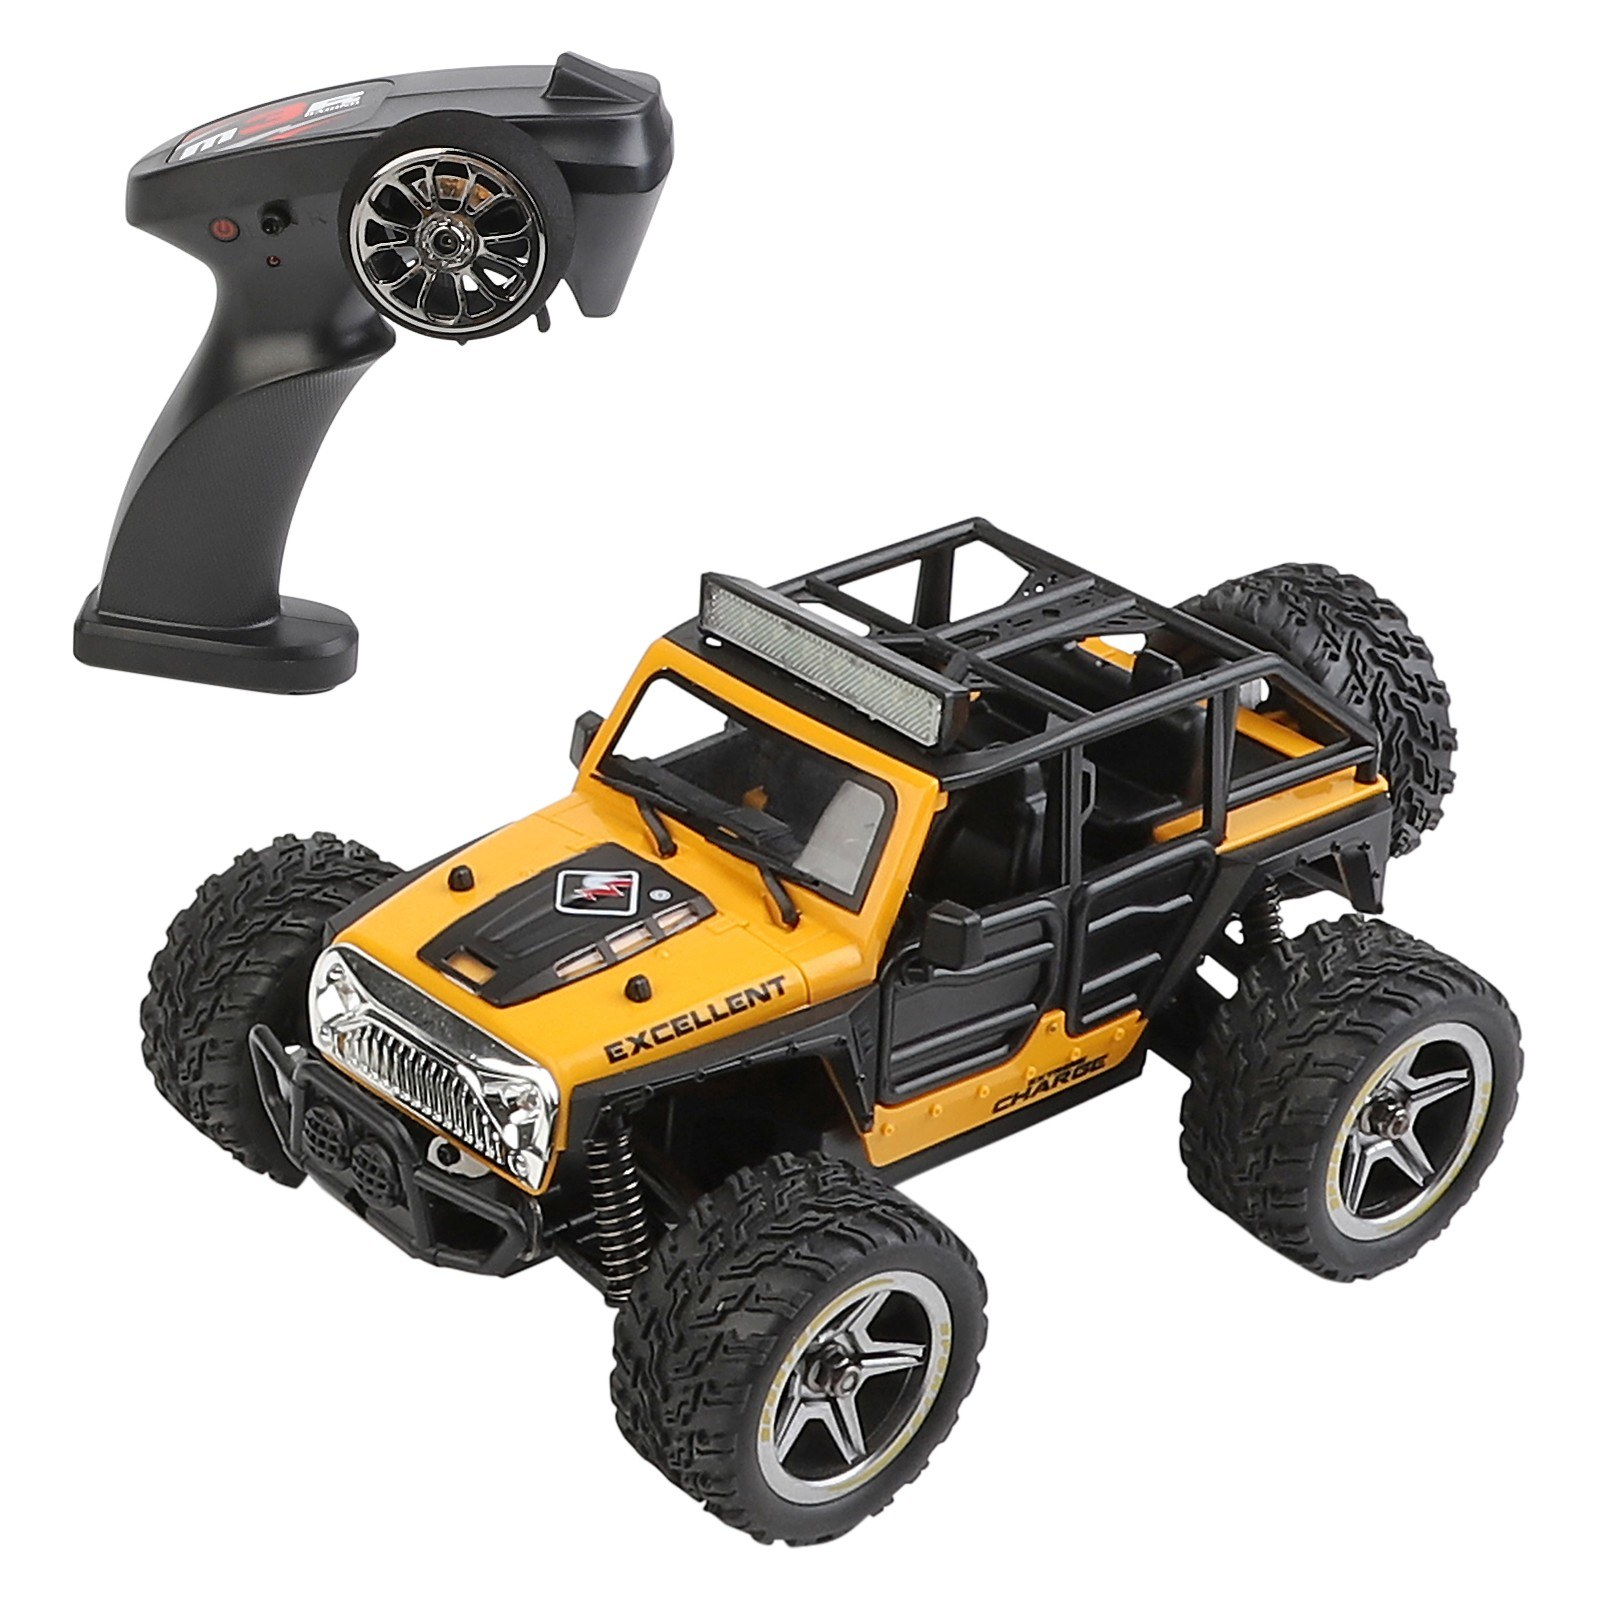 tomtop.com - 63% OFF WLtoys 22201 RC Car 1/22 2.4GHz Remote Control Car RTR, $38.99 (Inclusive of VAT)